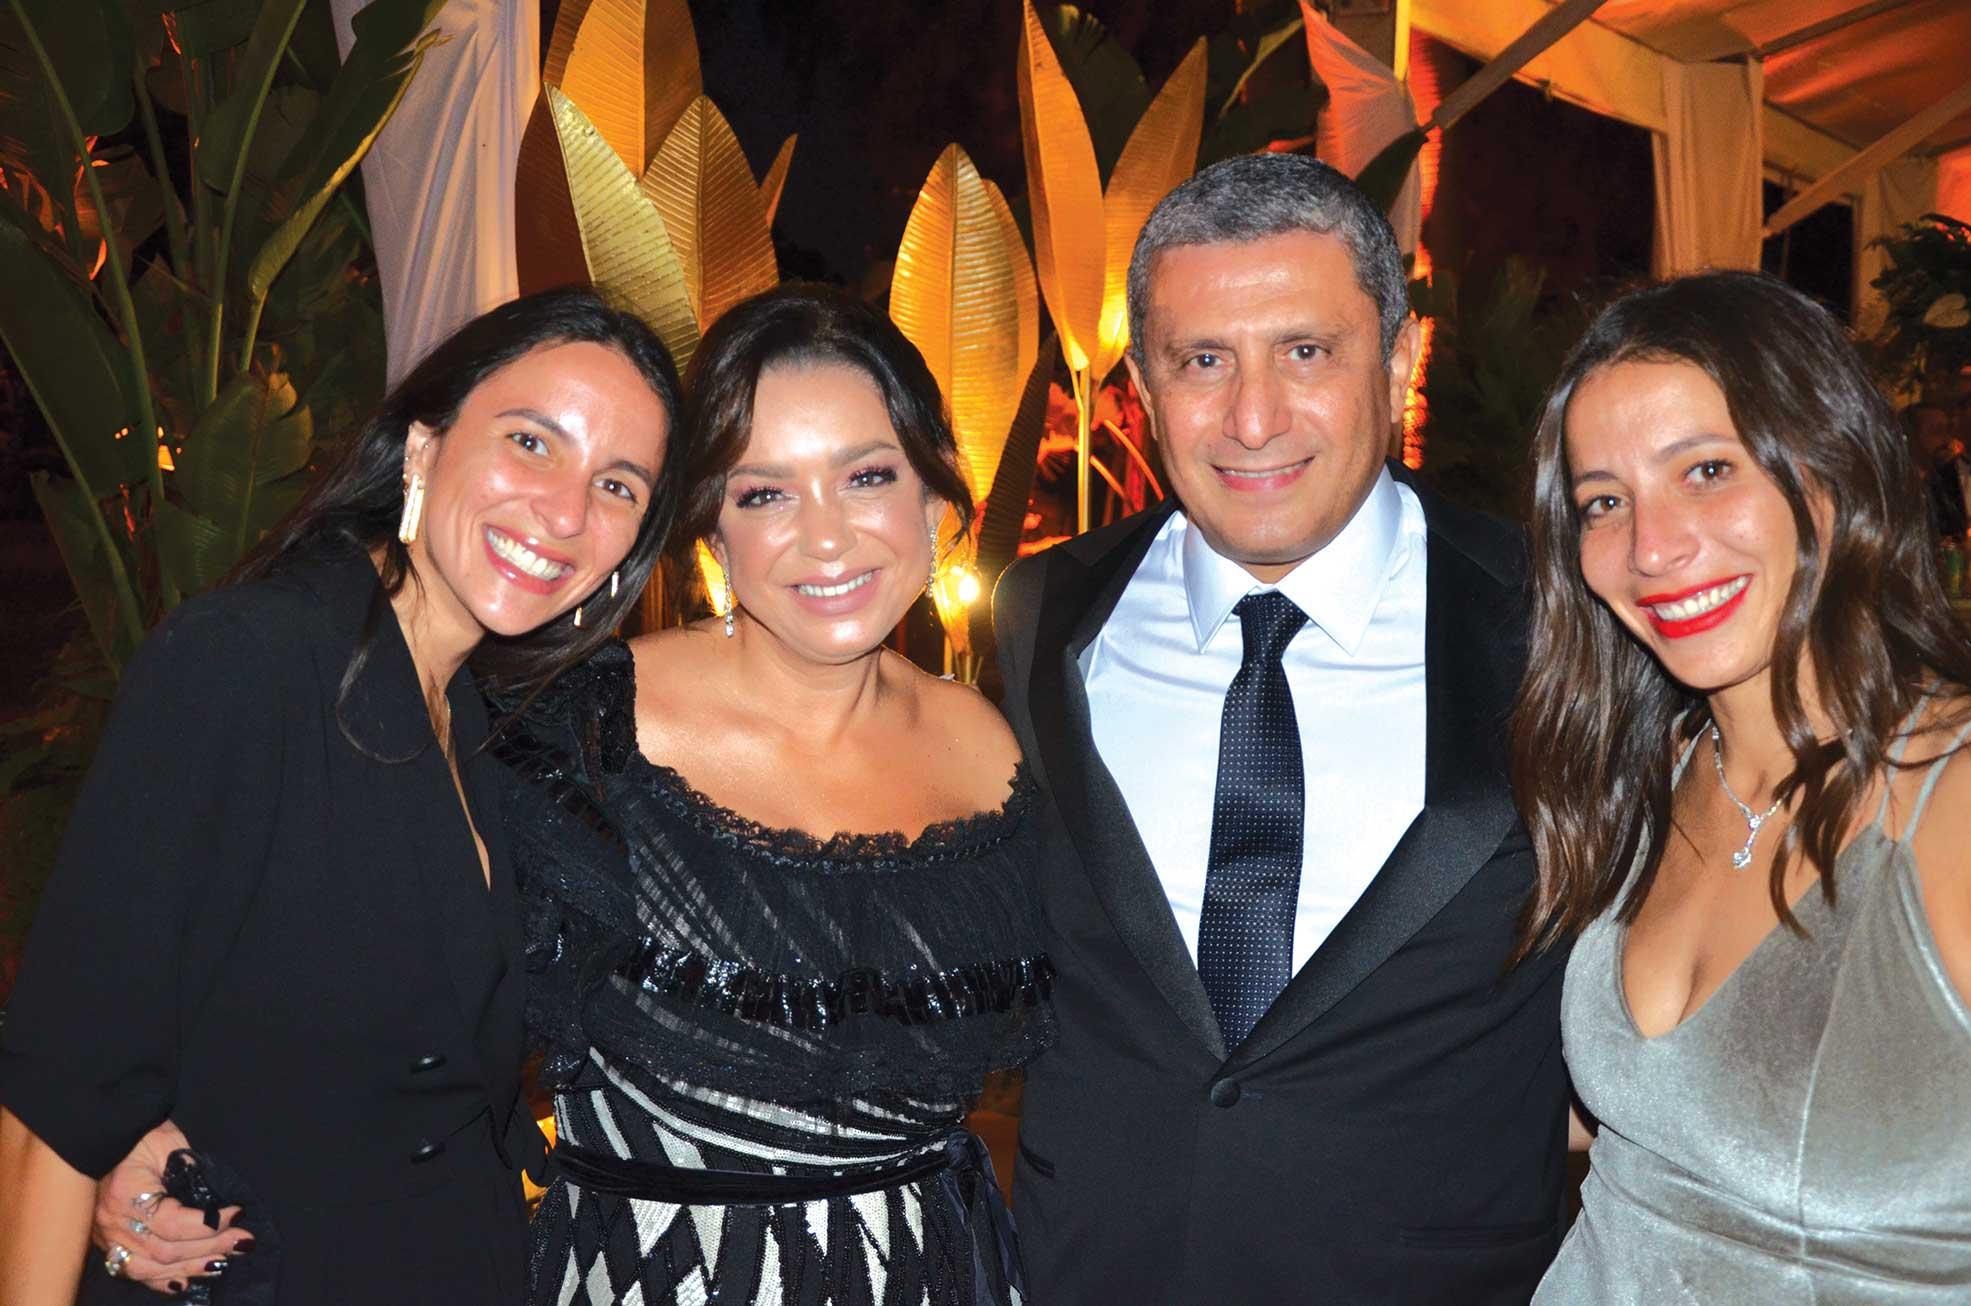 Ms. Nousha Abdallah, Ms. Rasha ElAgroudy, Mr. Medhat Abdallah & Ms. Mariam Abdallah